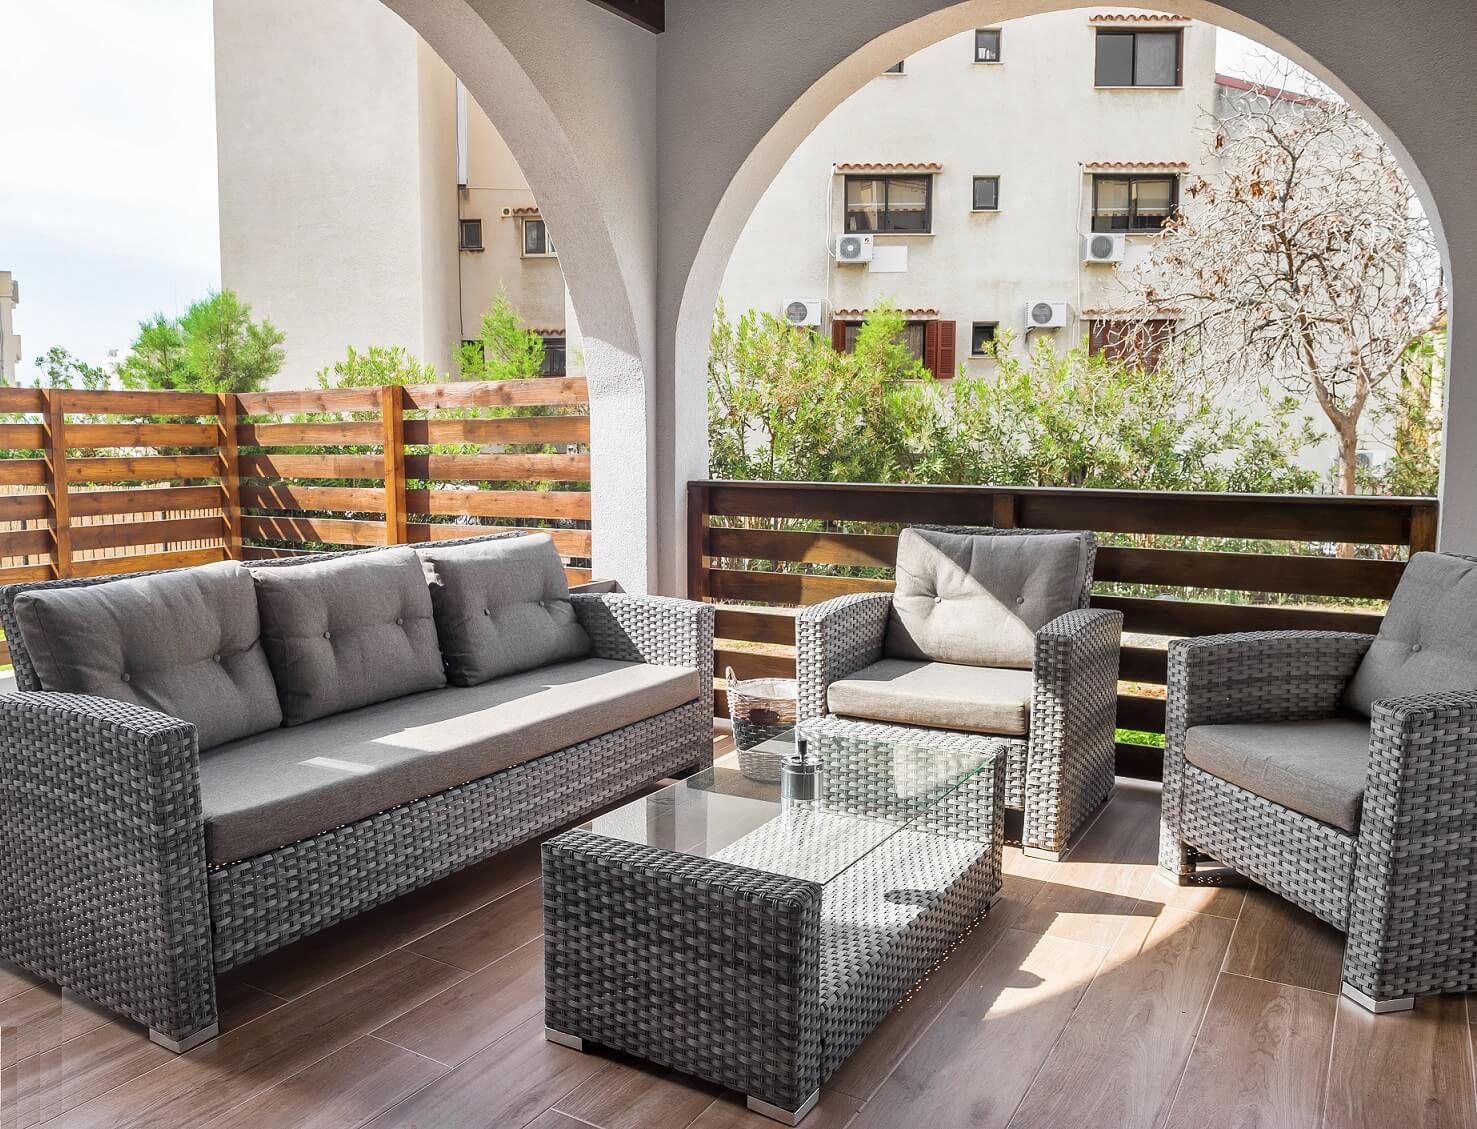 1 Bedroom Ground Floor Apartment – Agios Tychonas Tourist area